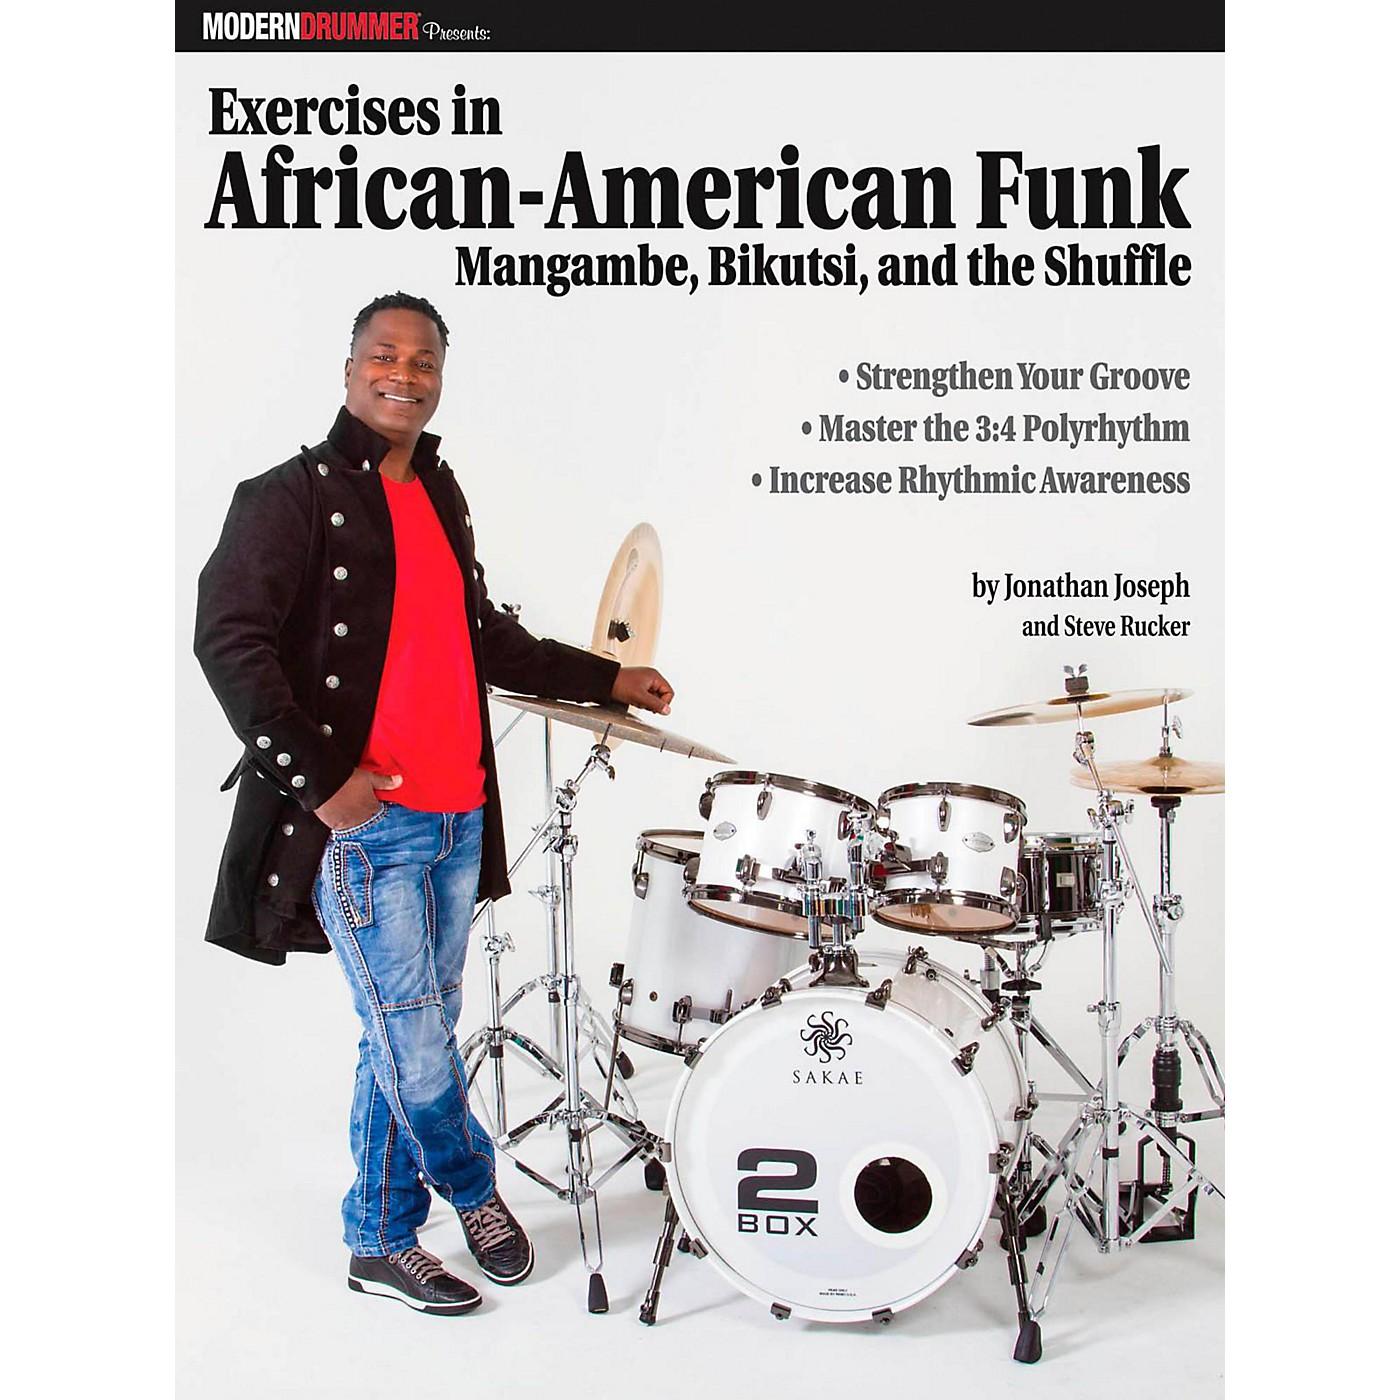 Modern Drummer Modern Drummer Exercises In African-American Funk Mangambe, Bikutsi and The Shuffle thumbnail